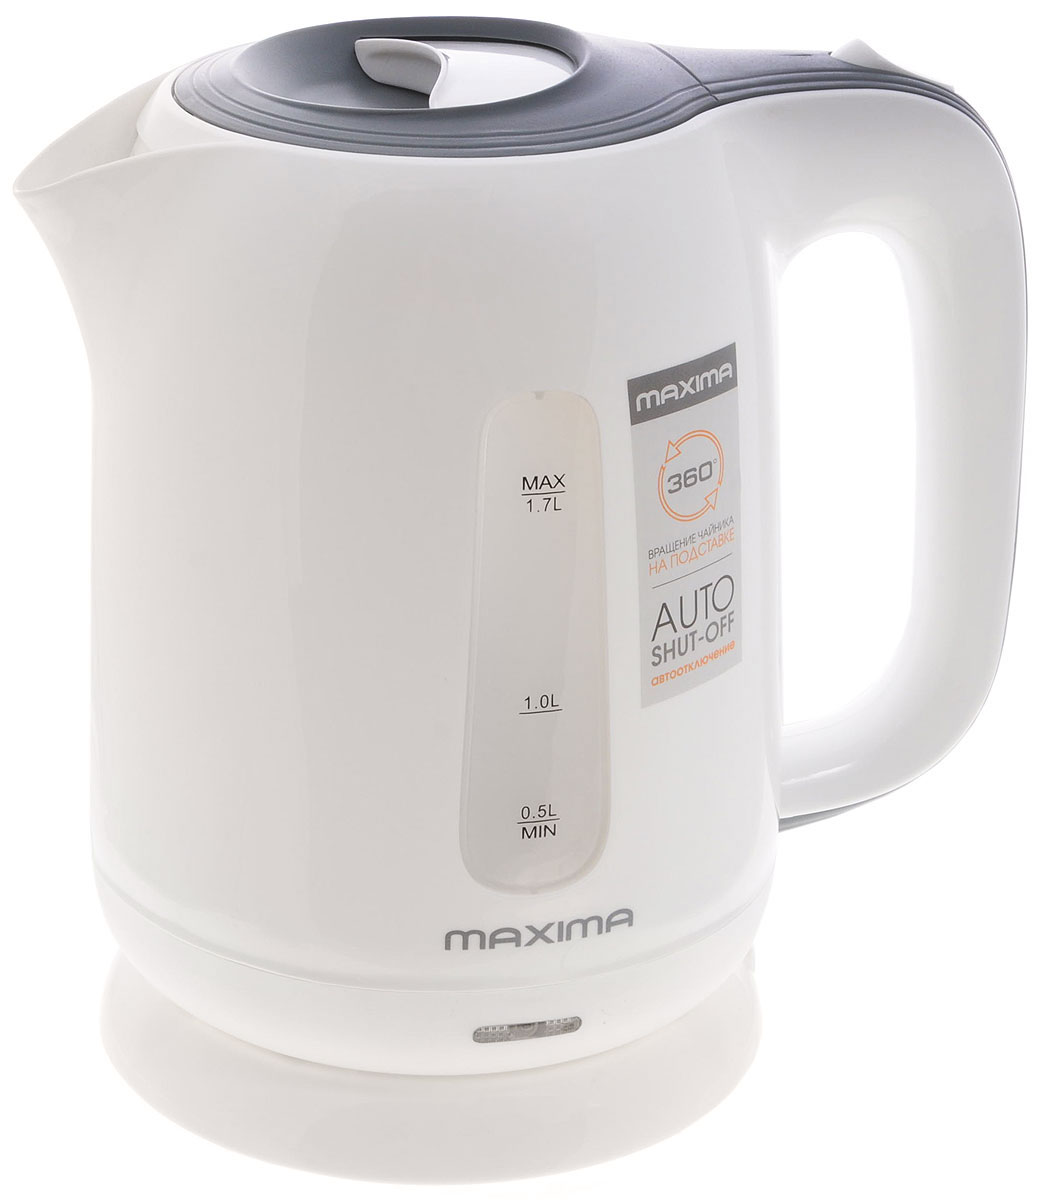 Maxima MK-472 электрический чайник